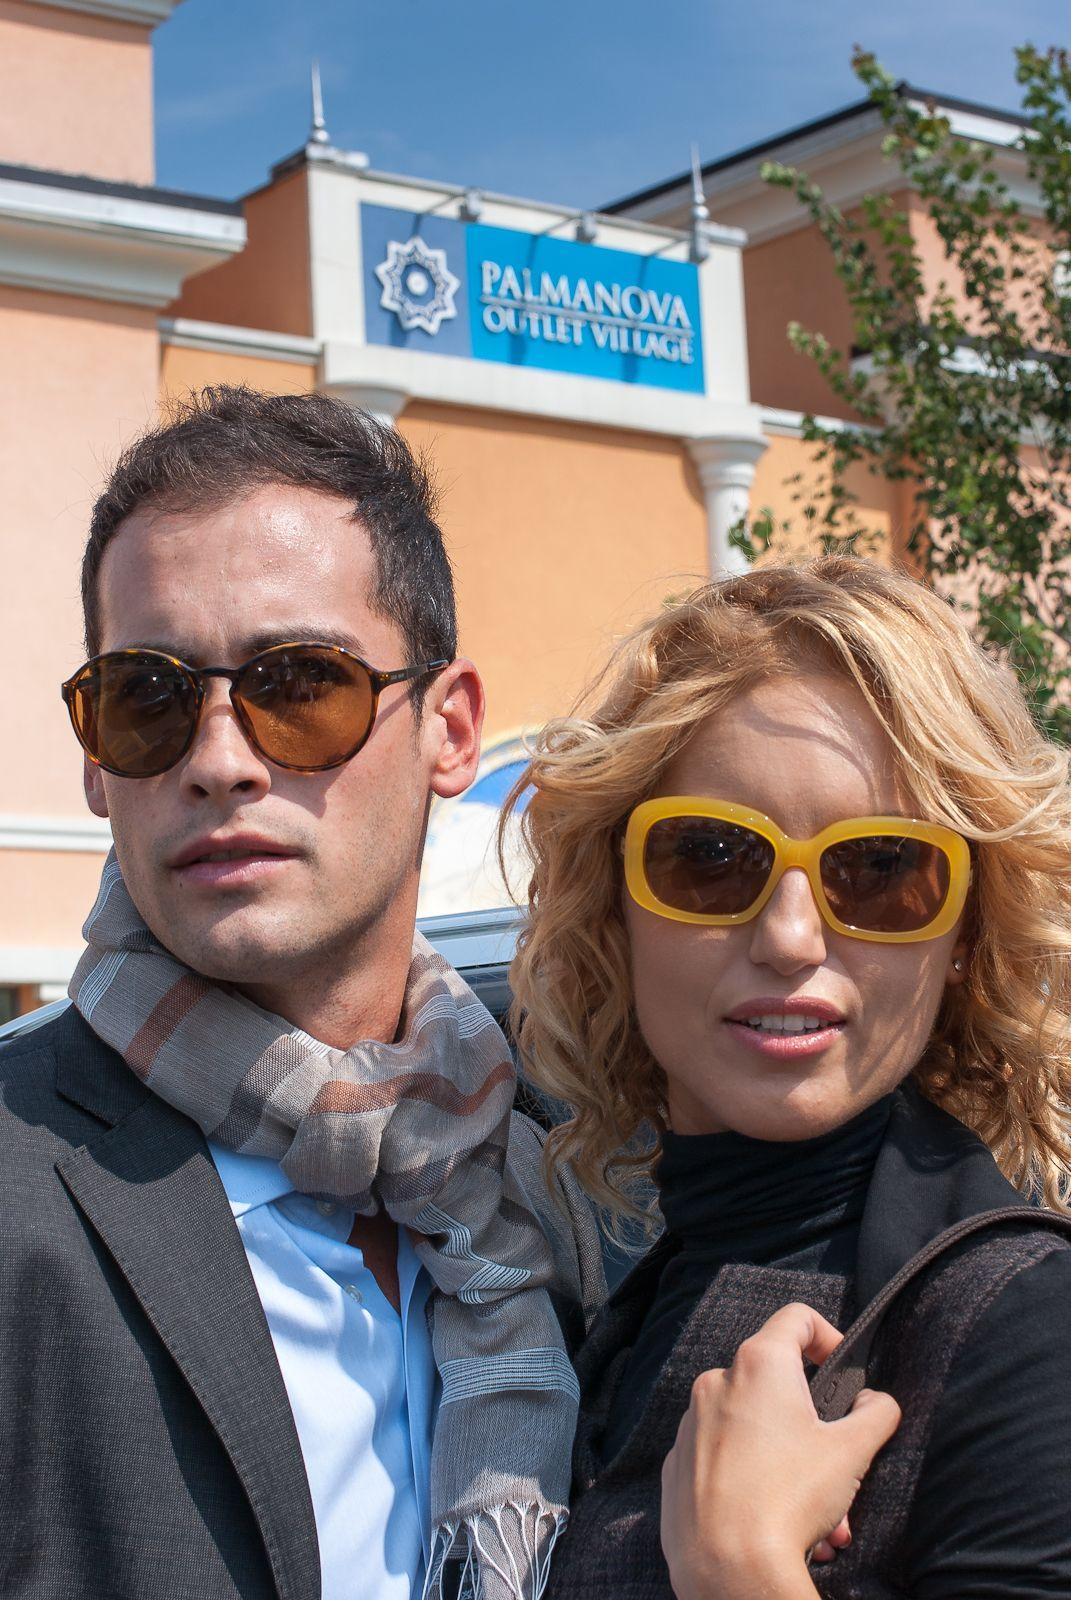 Occhiali donna: Max Mara pr. orginale 170,00 pr. outlet 79,00;  Occhiali uomo: Armani pr. originale 220,00 pr. outlet 119,00